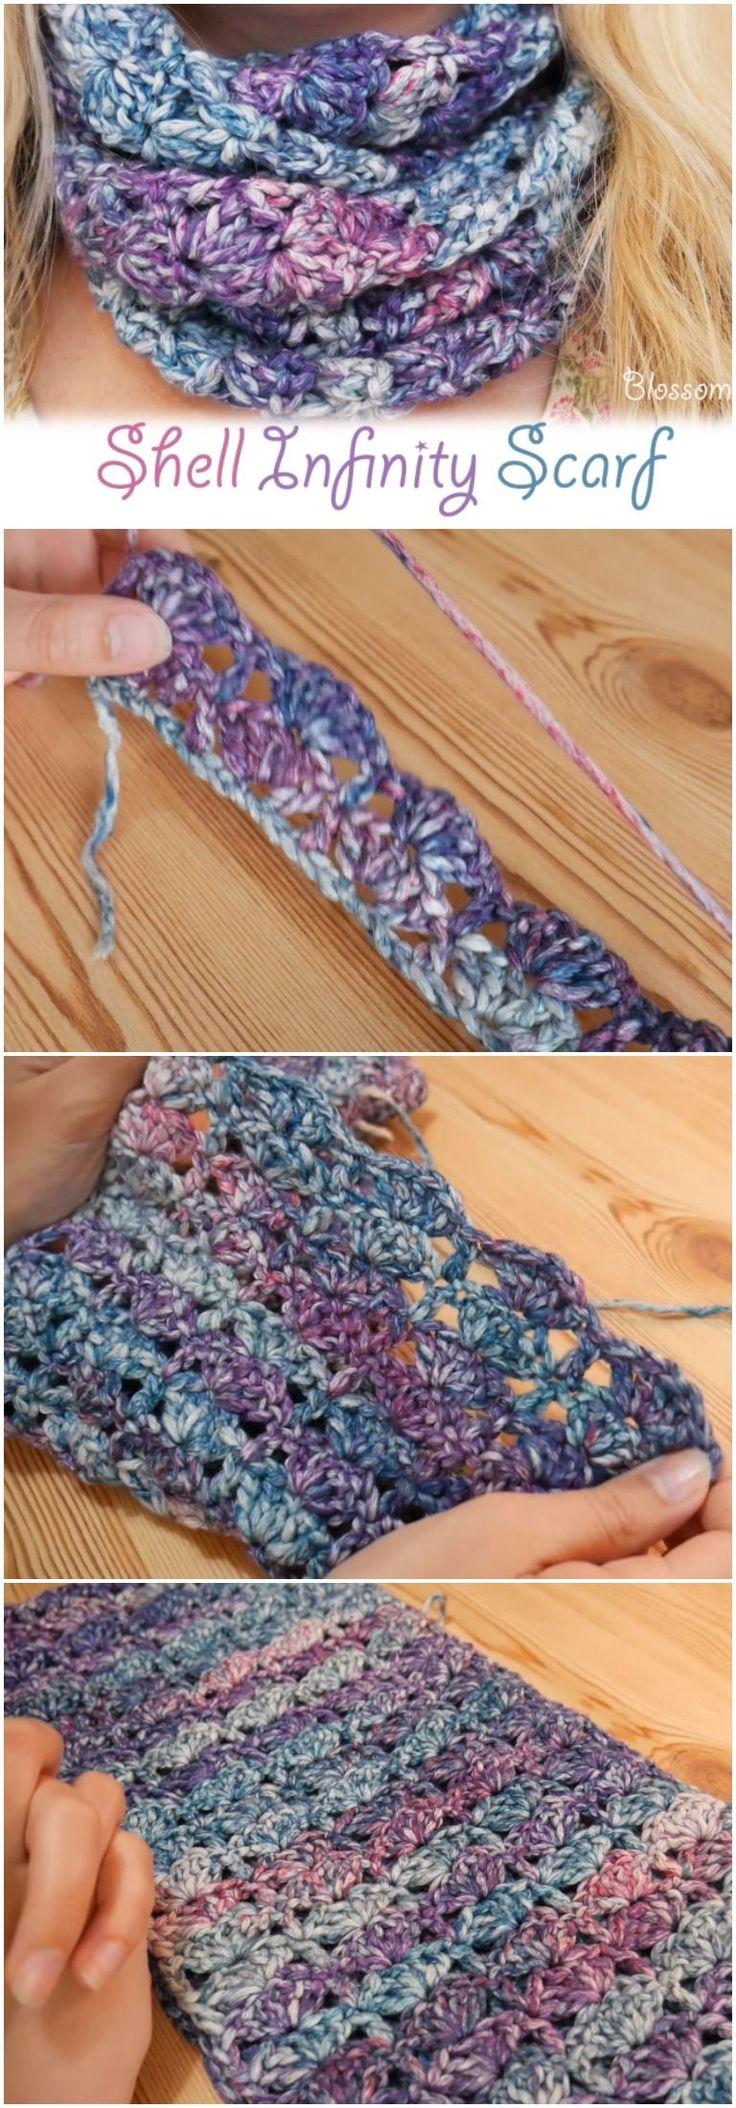 Crochet Shell Infinity Scarf Free Instructions